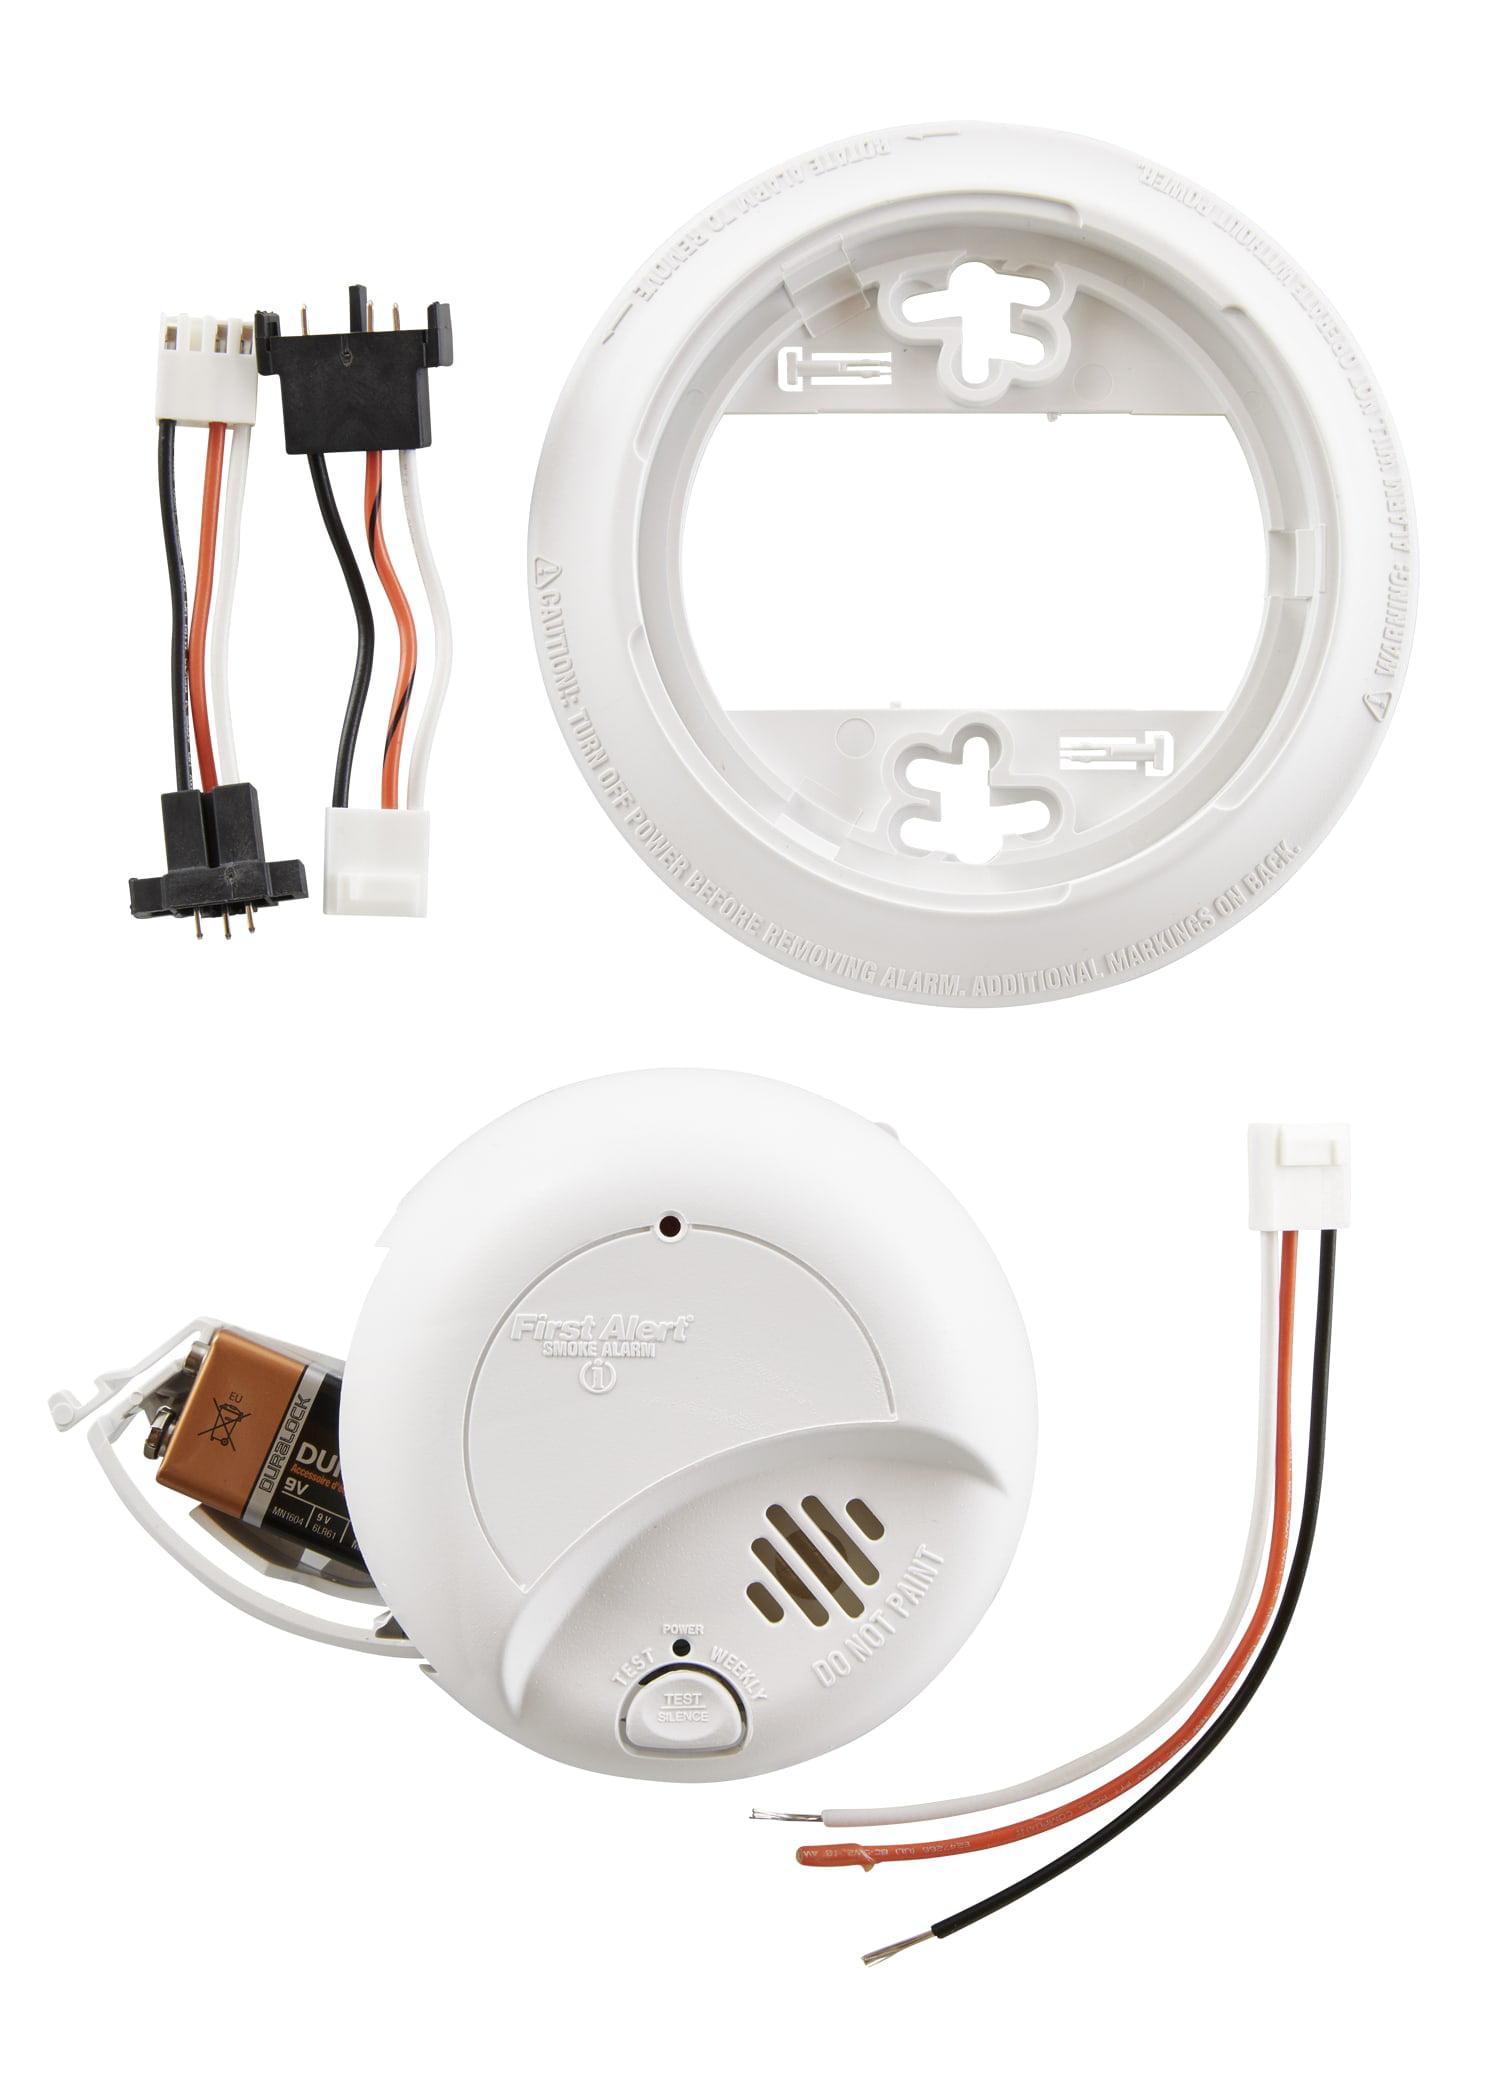 First Alert Sa9120bpcn 120v Ac Hardwired Smoke Alarm With Adapter Firex Wiring Diagram On Kidde Plugs